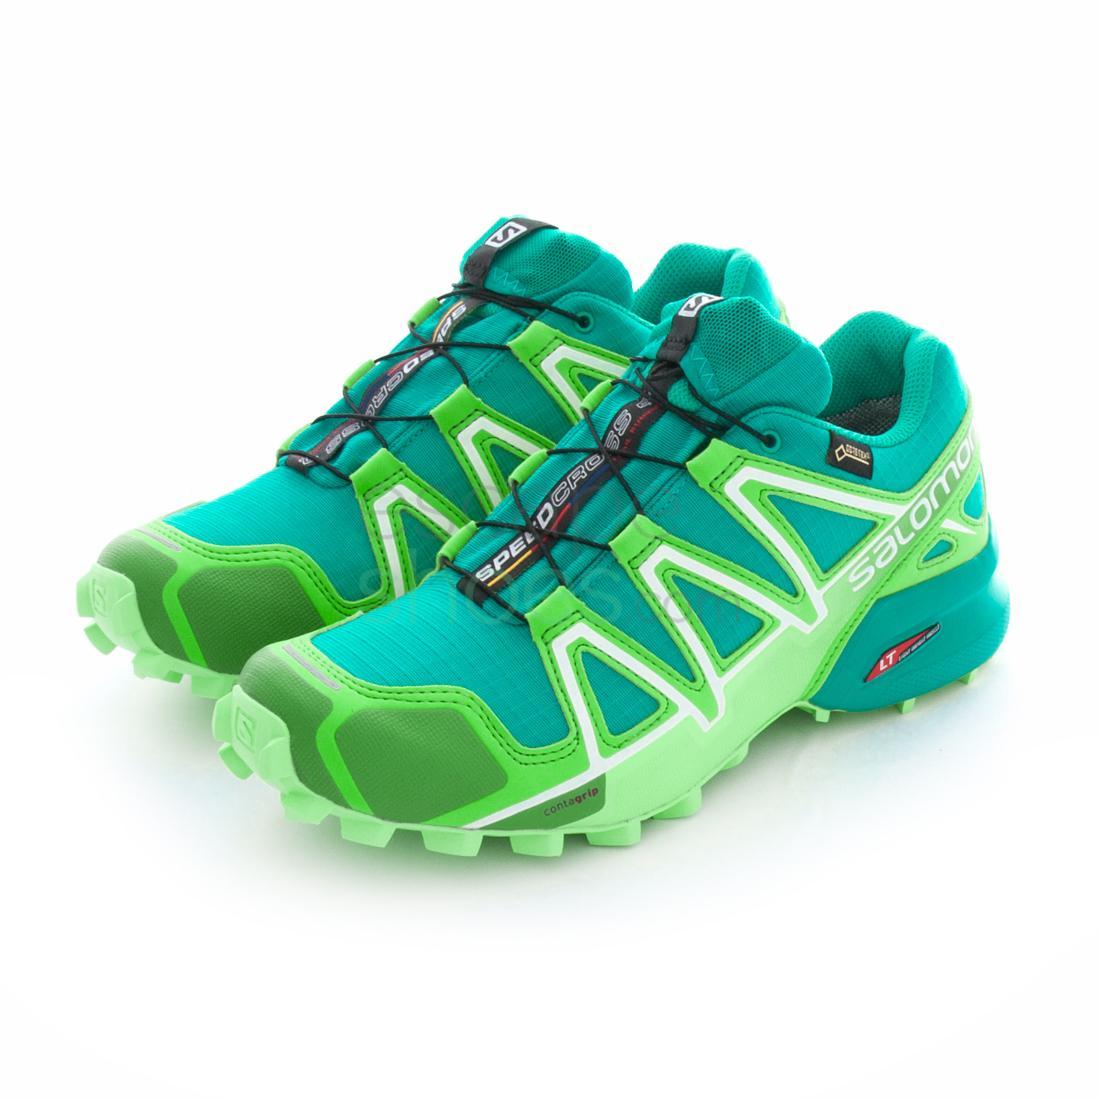 nouvelle arrivee 2a624 51d94 Sneakers SALOMON Speedcross 4 Gore-Tex Teal Blue Peppermint ...